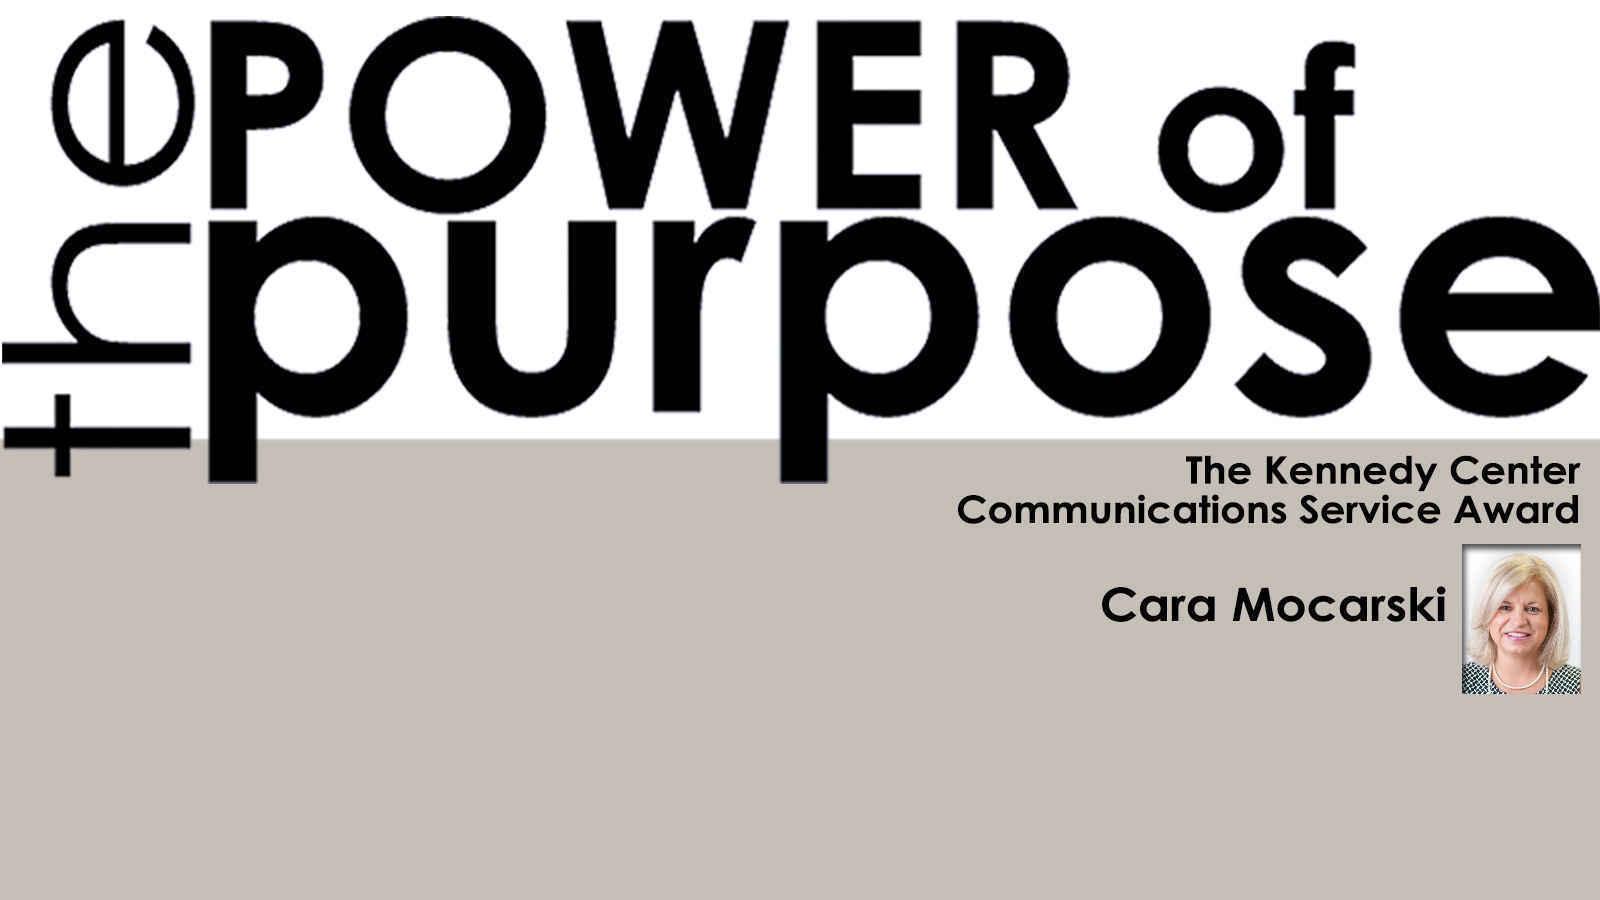 Make a gift to Honor and Congratulate Cara Mocarski, Communications Service Award winner image